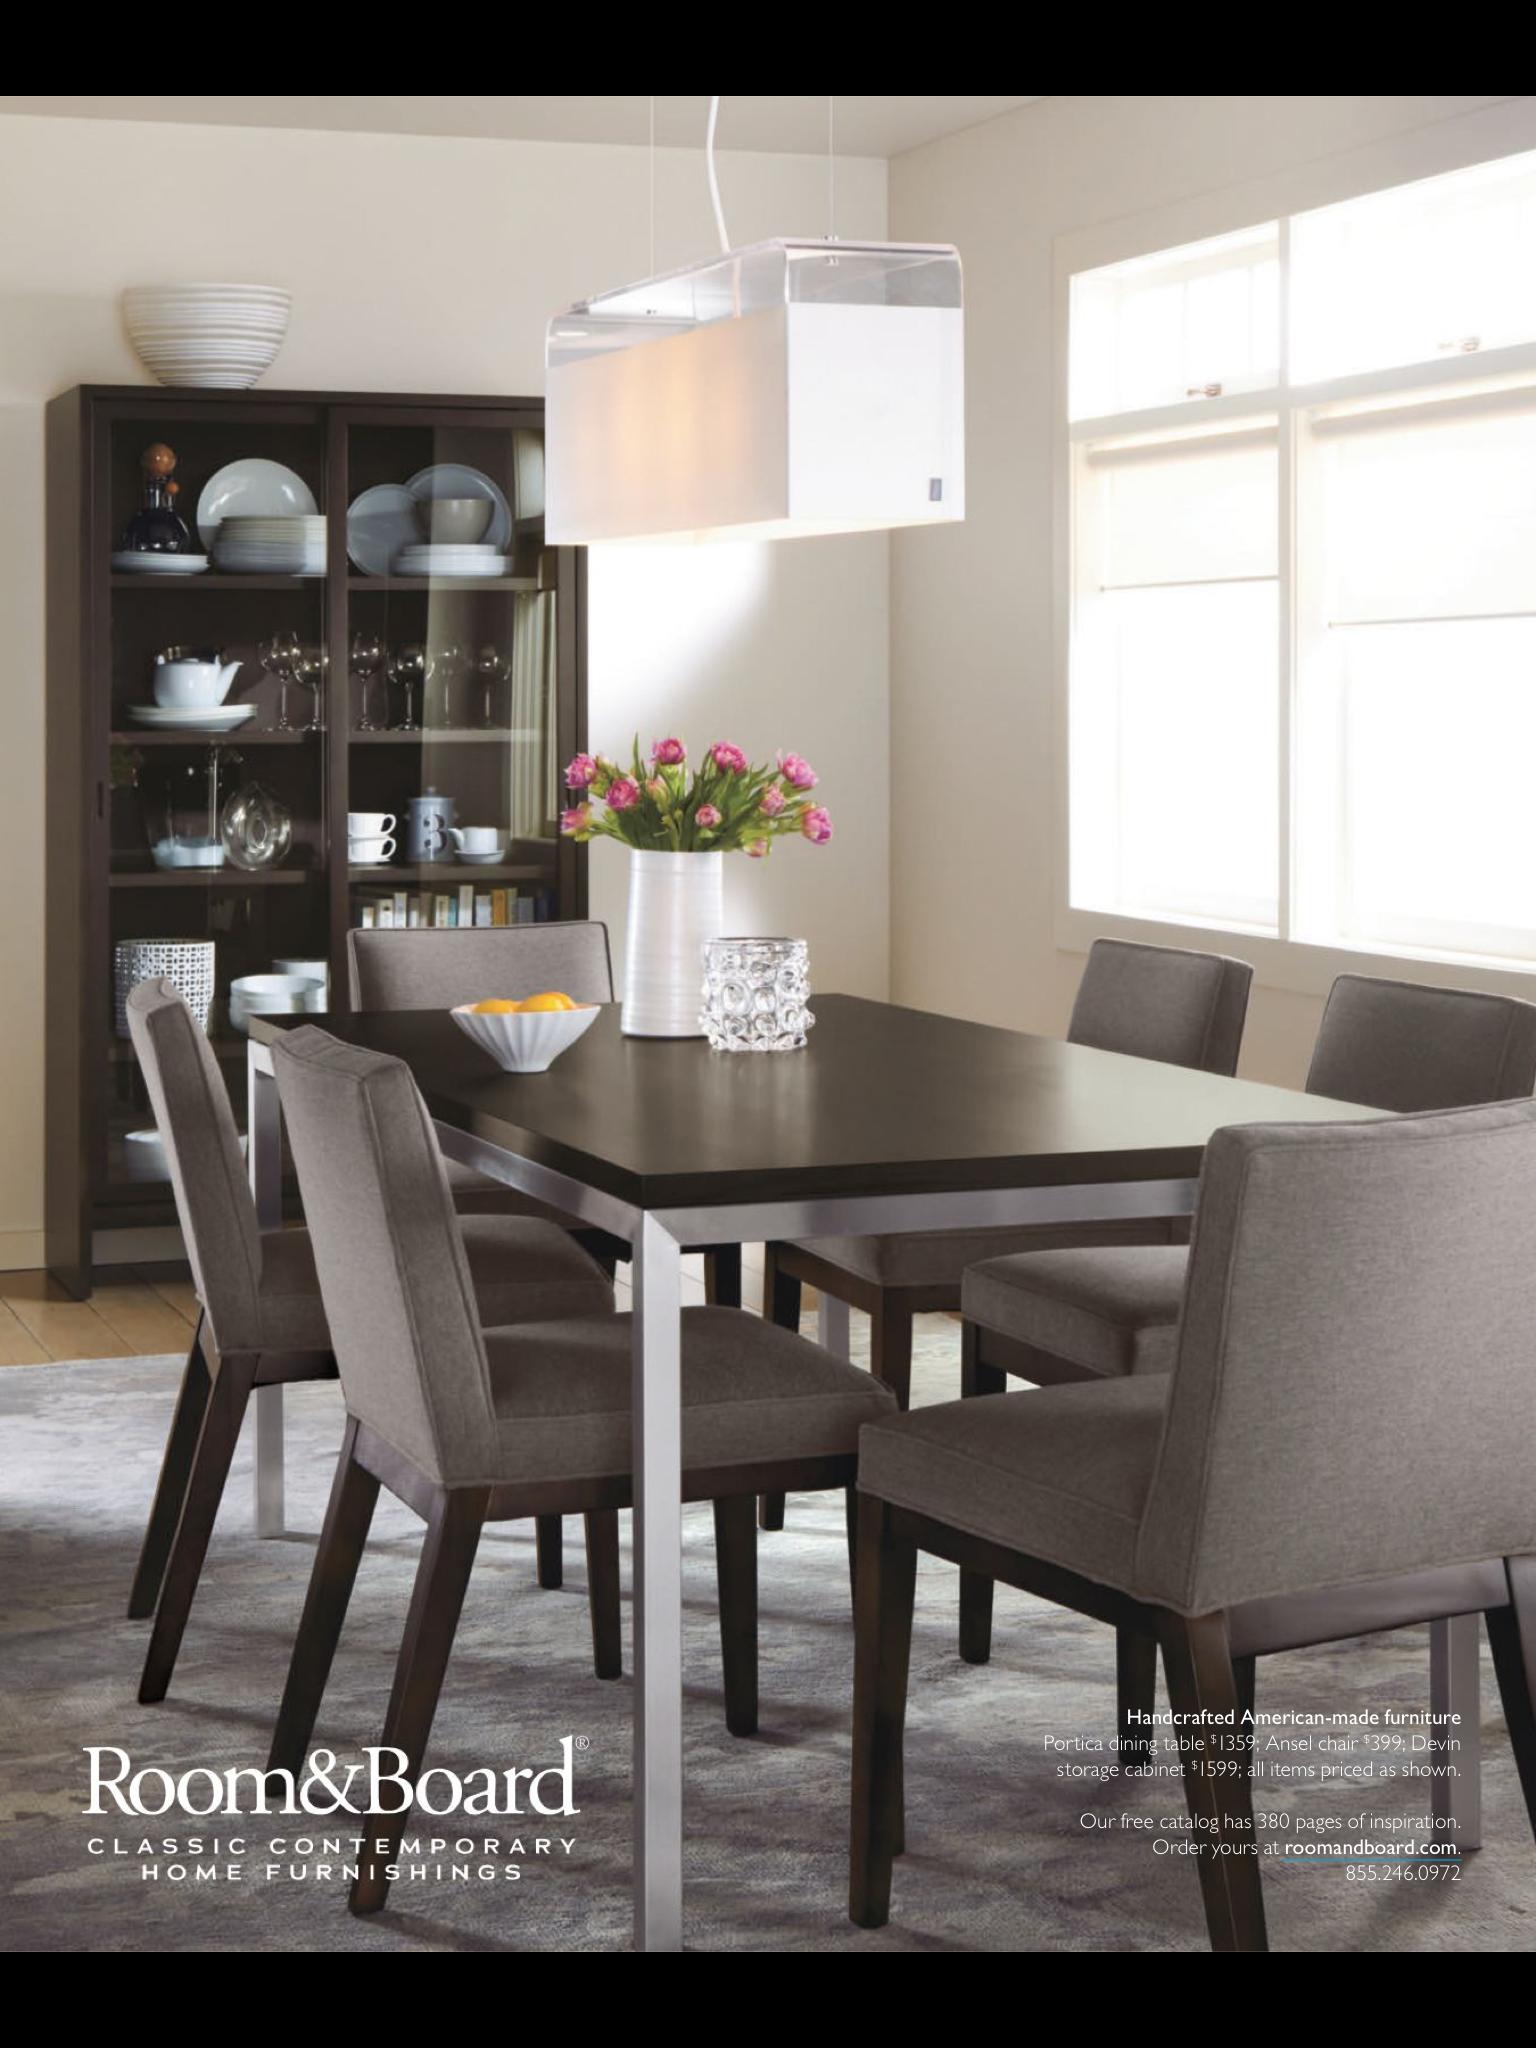 Classic american home interior dining room elle decor  home u garden  pinterest  elle decor and room